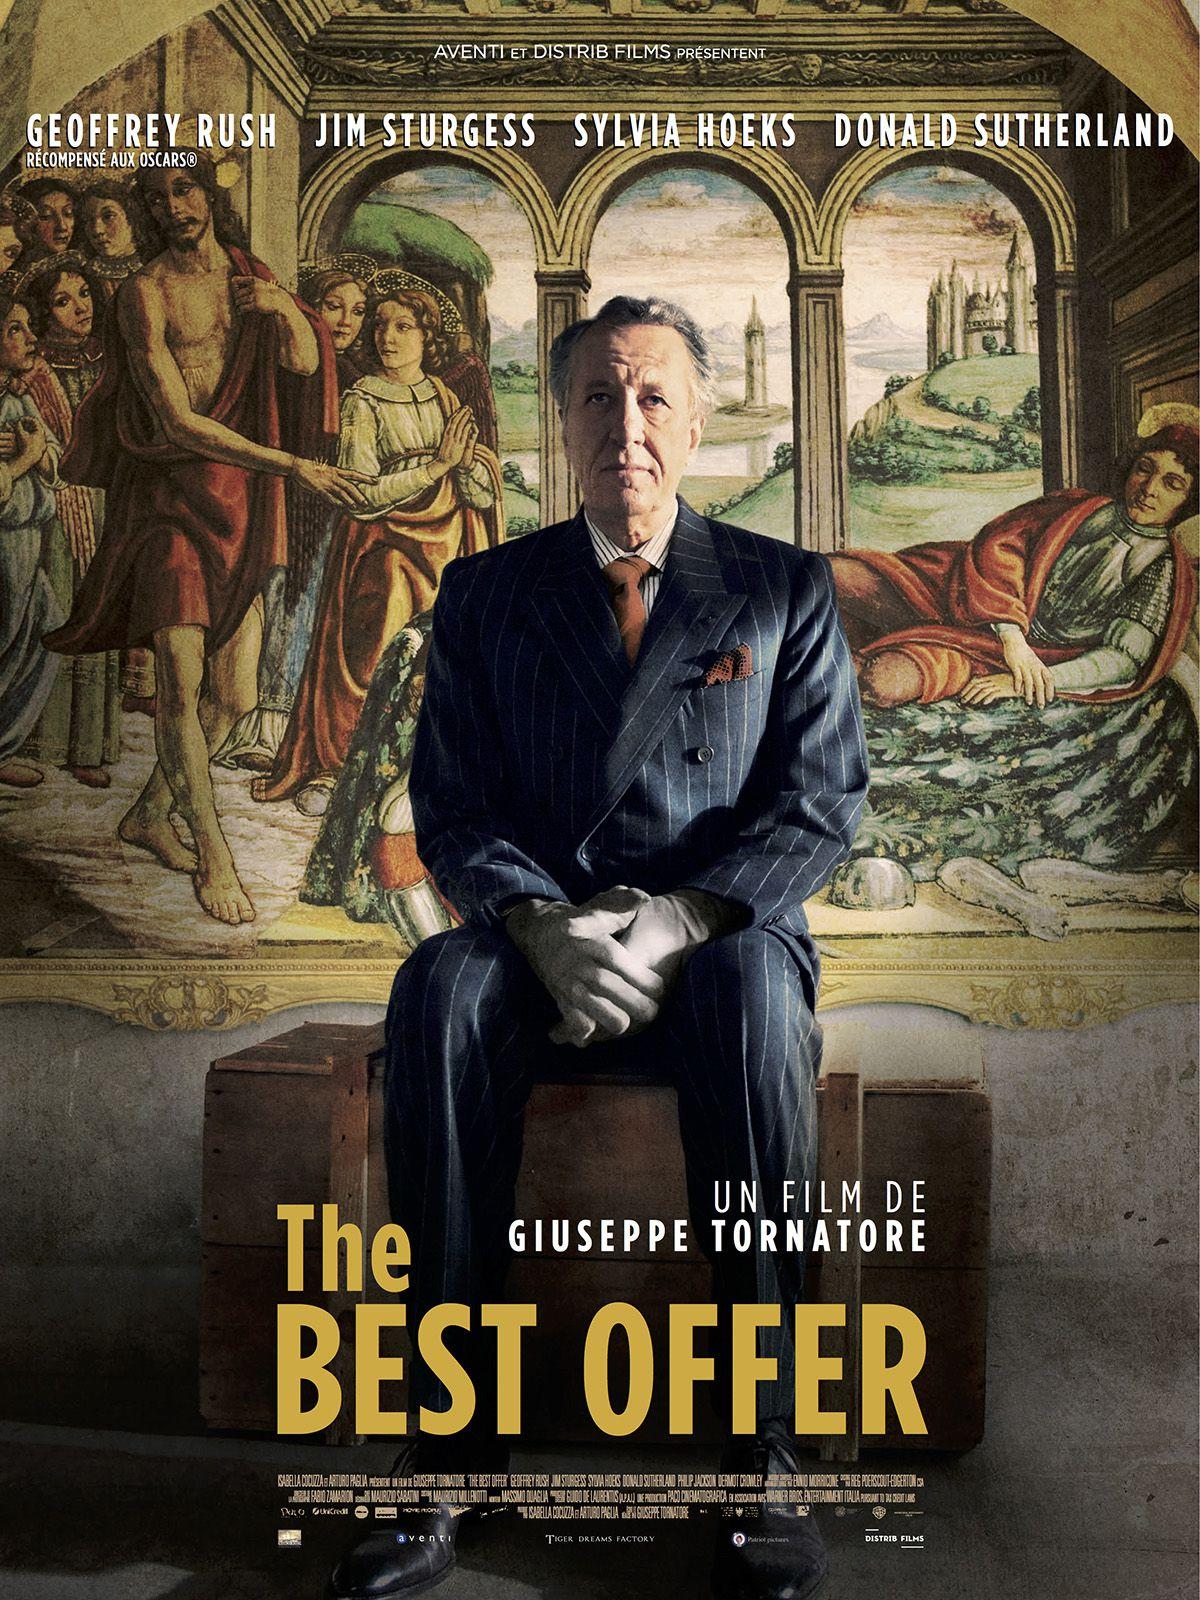 The Best Offer - Film (2013)